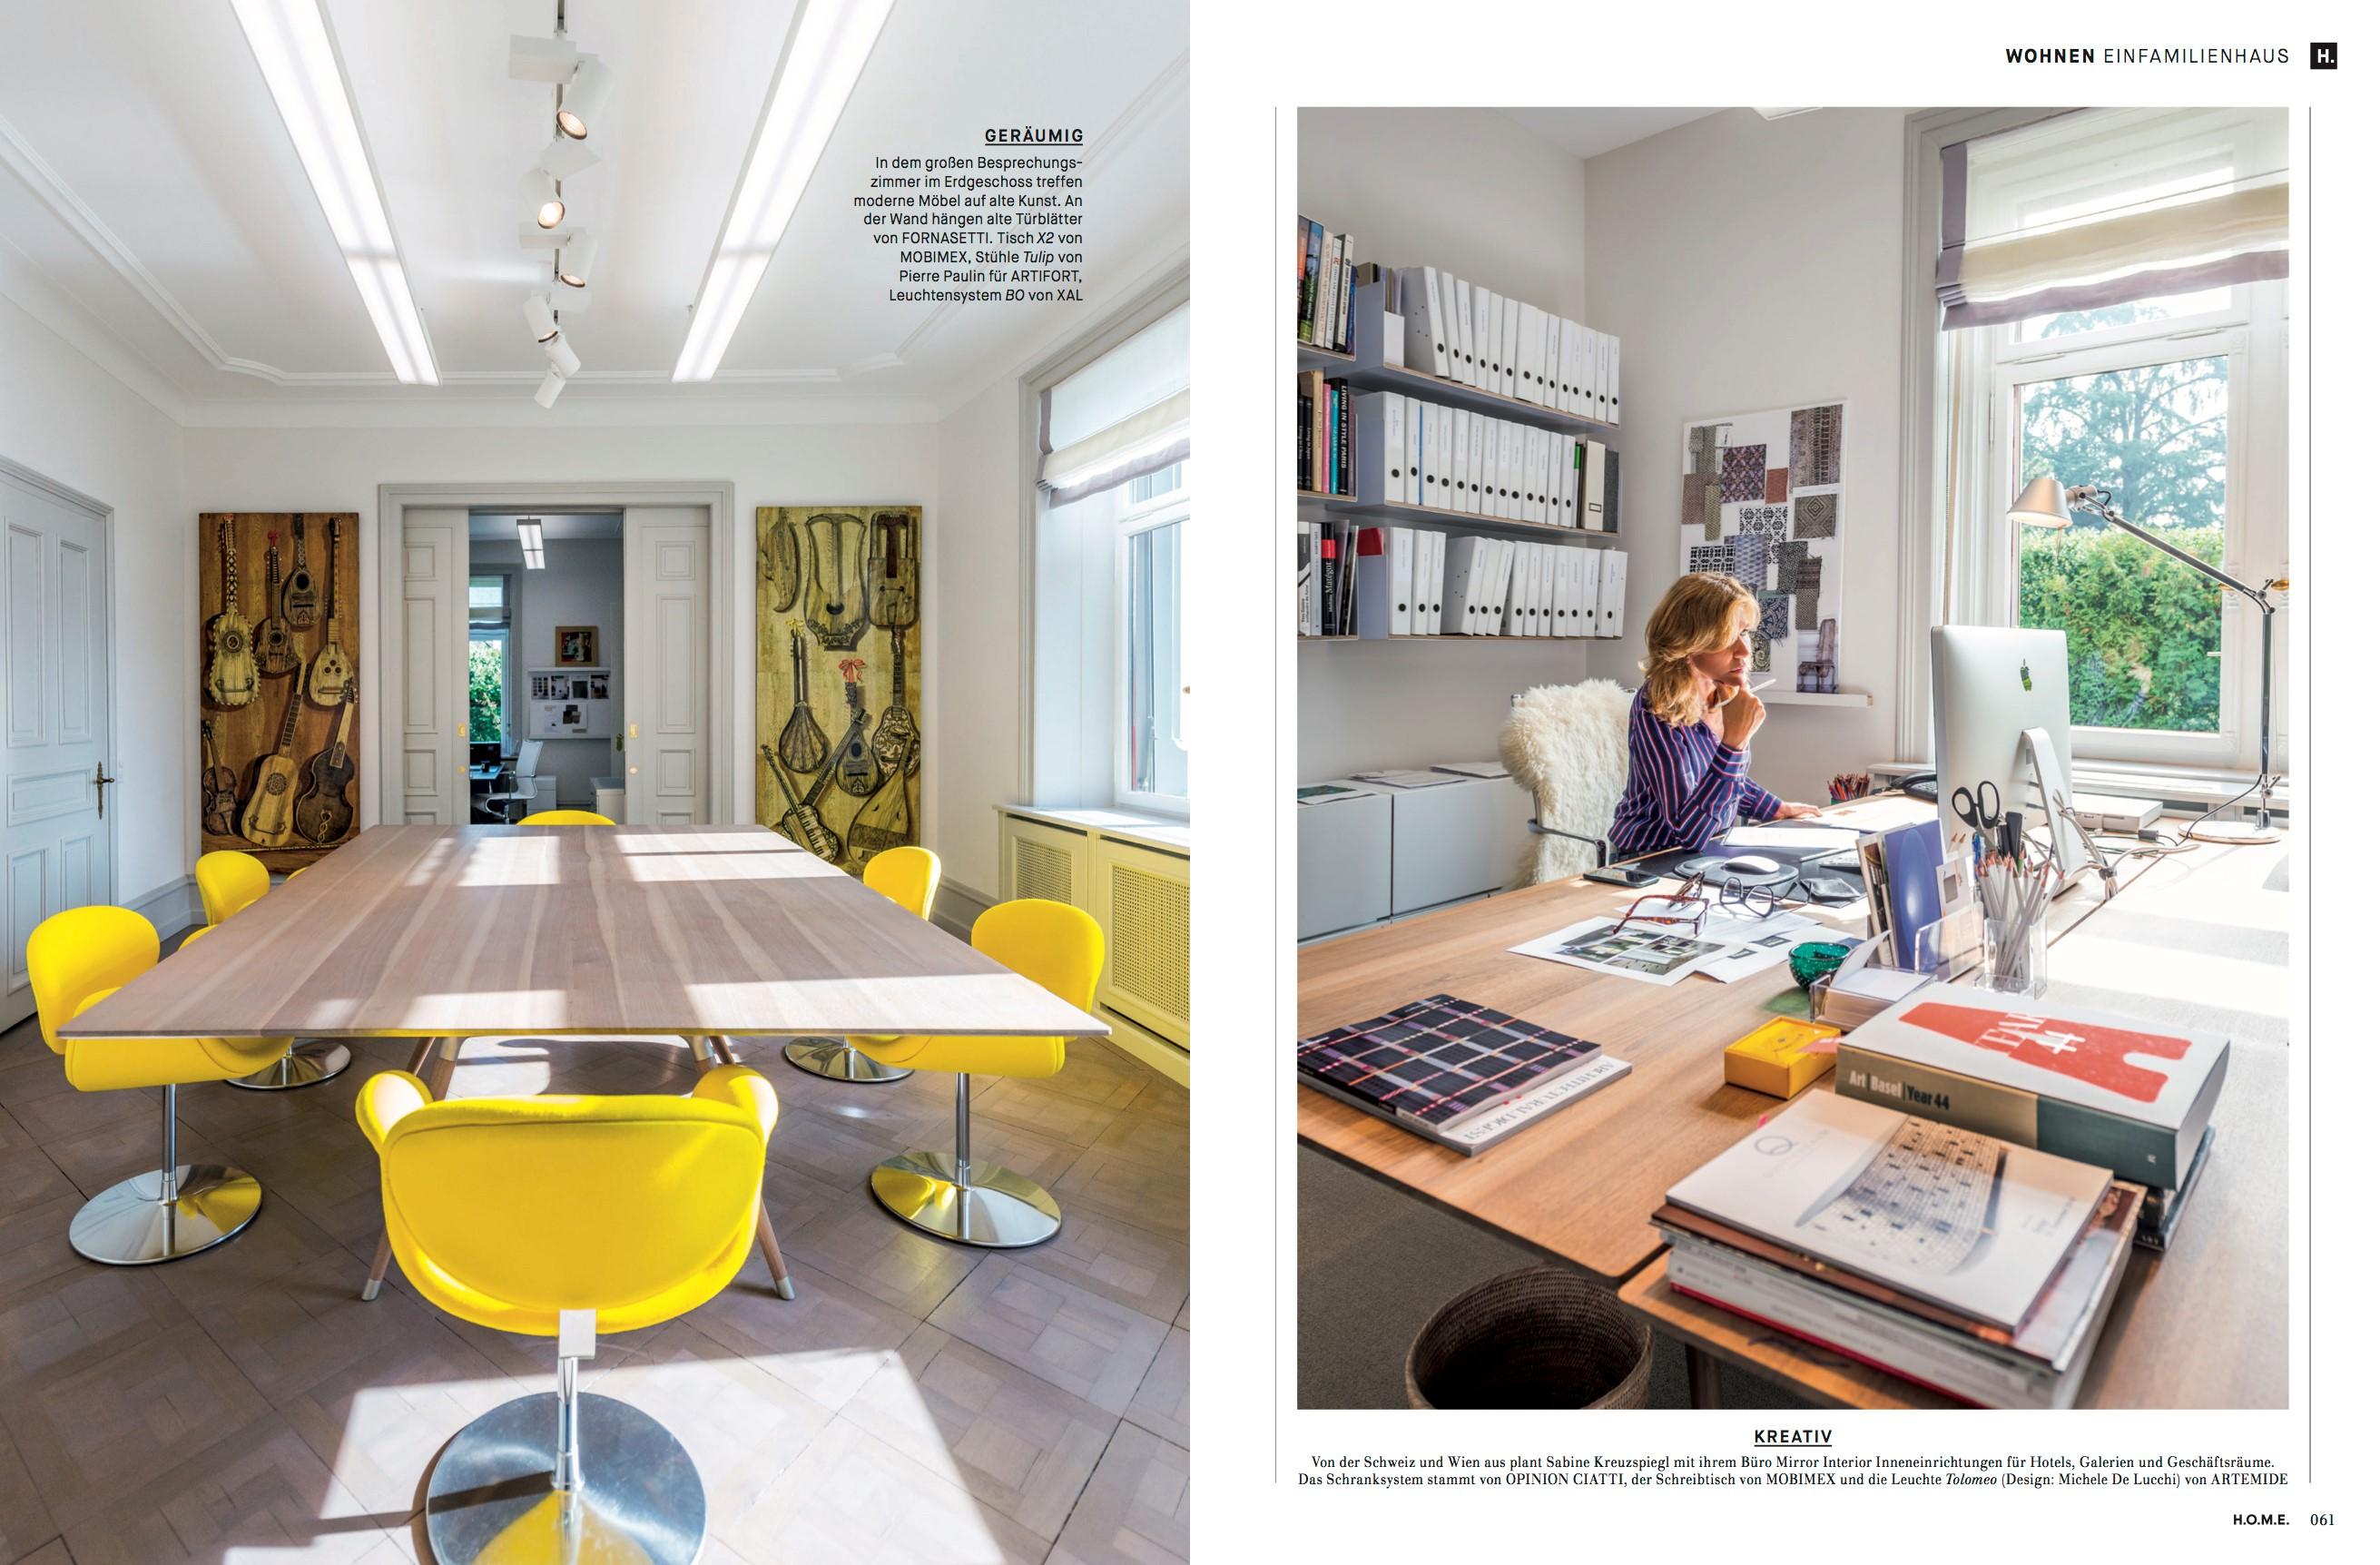 Interiordesignerin Sabine Kreuzspiel